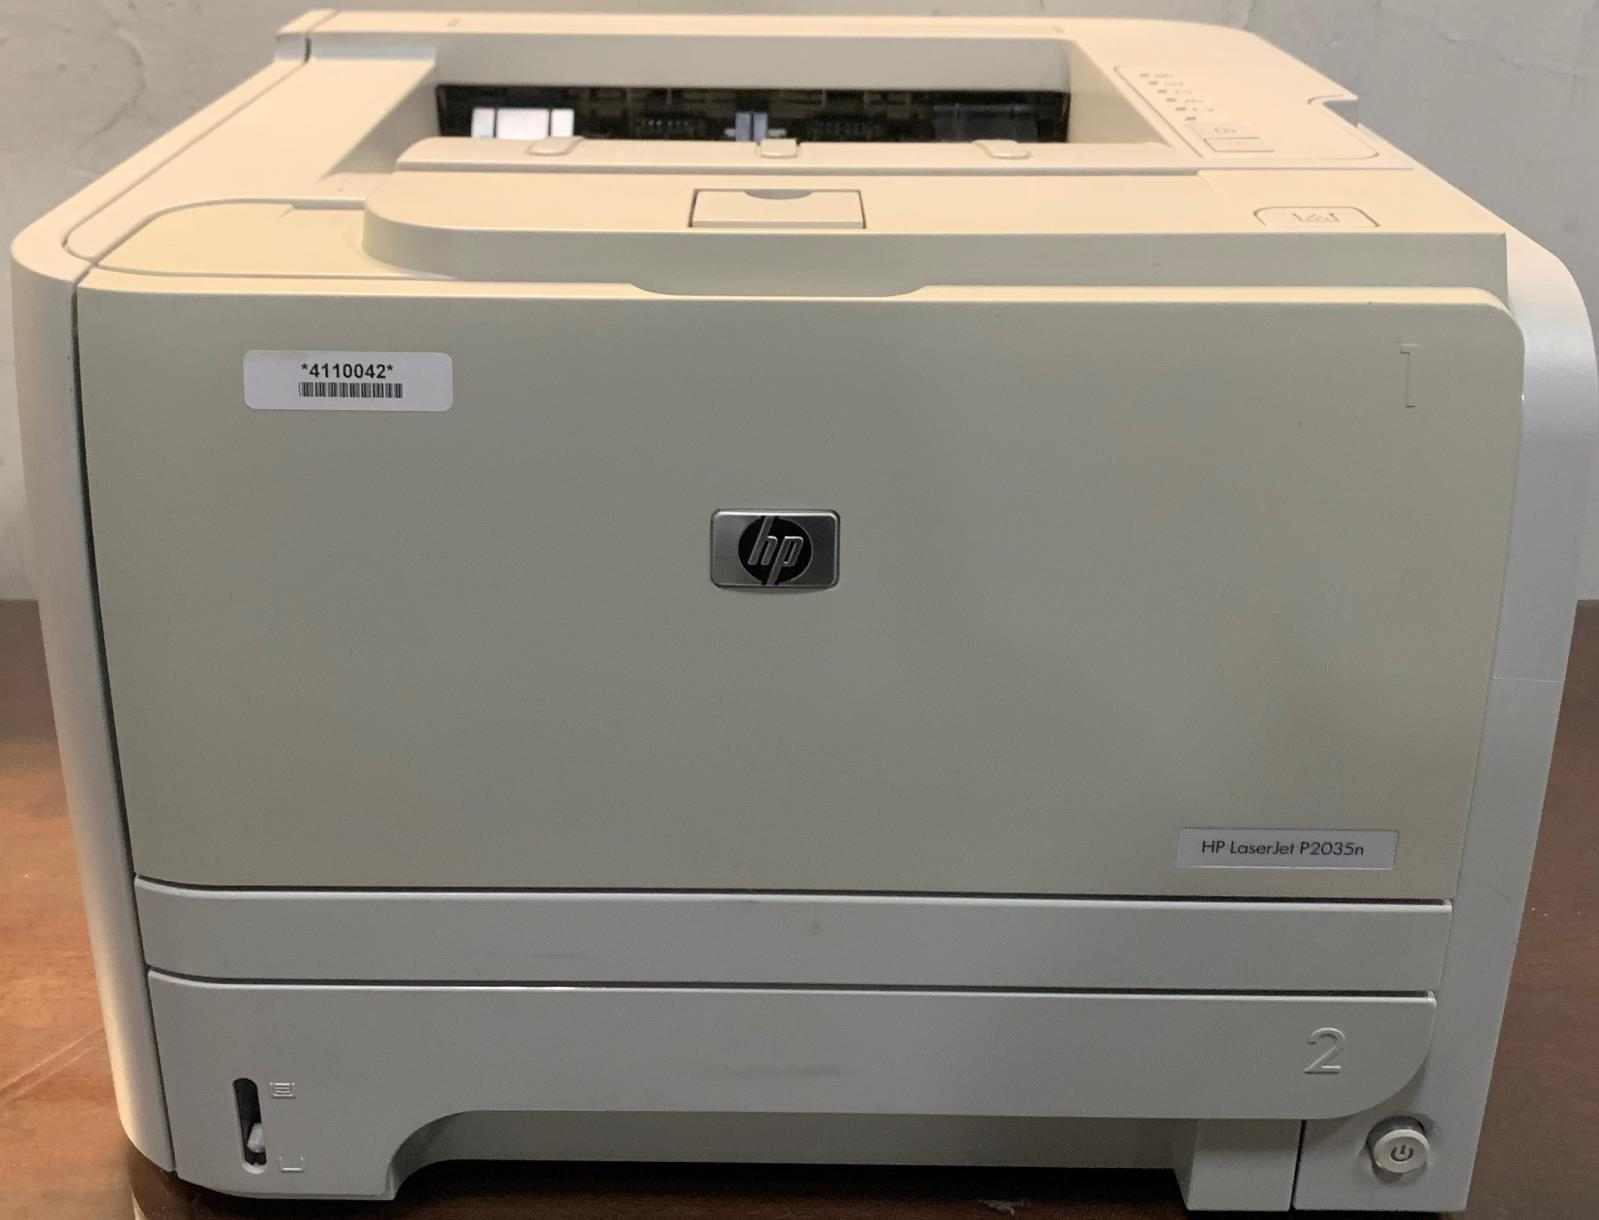 Details about HP LaserJet P2035N Workgroup Laser Printer Page Count 1100 No  Toner G2